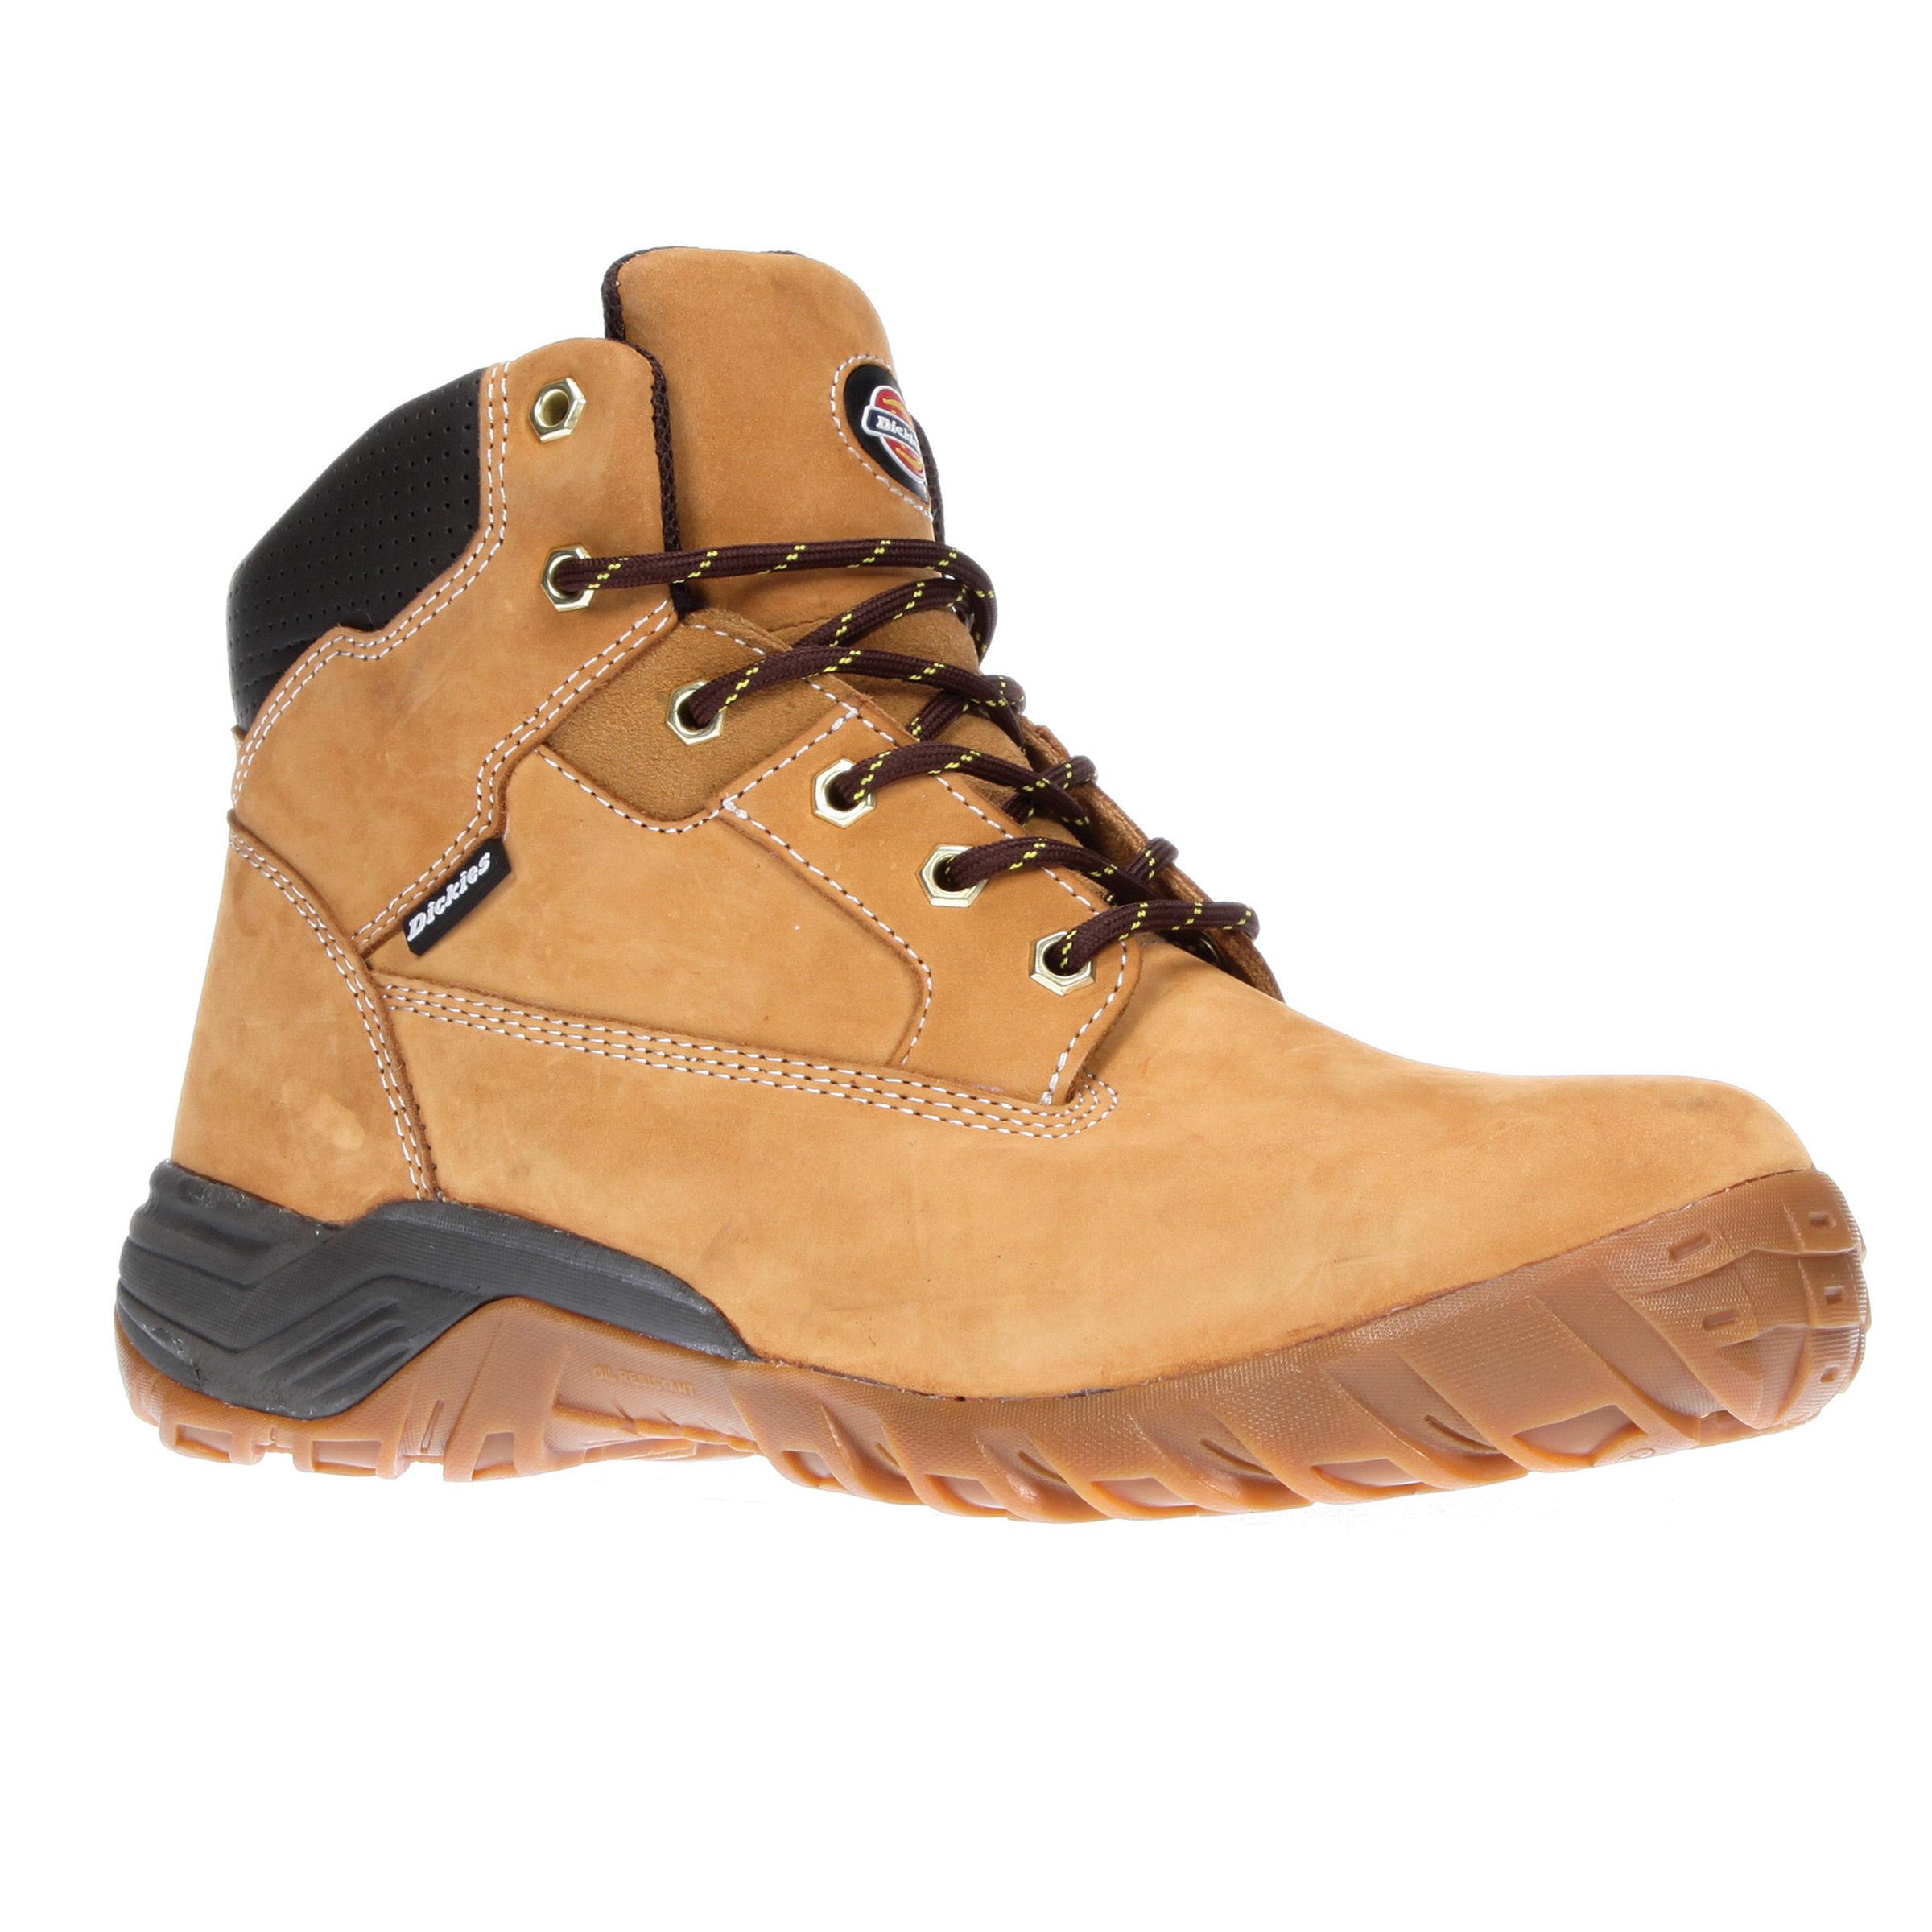 e223eeb6f91 Dickies FD9207 Graton Safety Boot (Honey) - Size 11